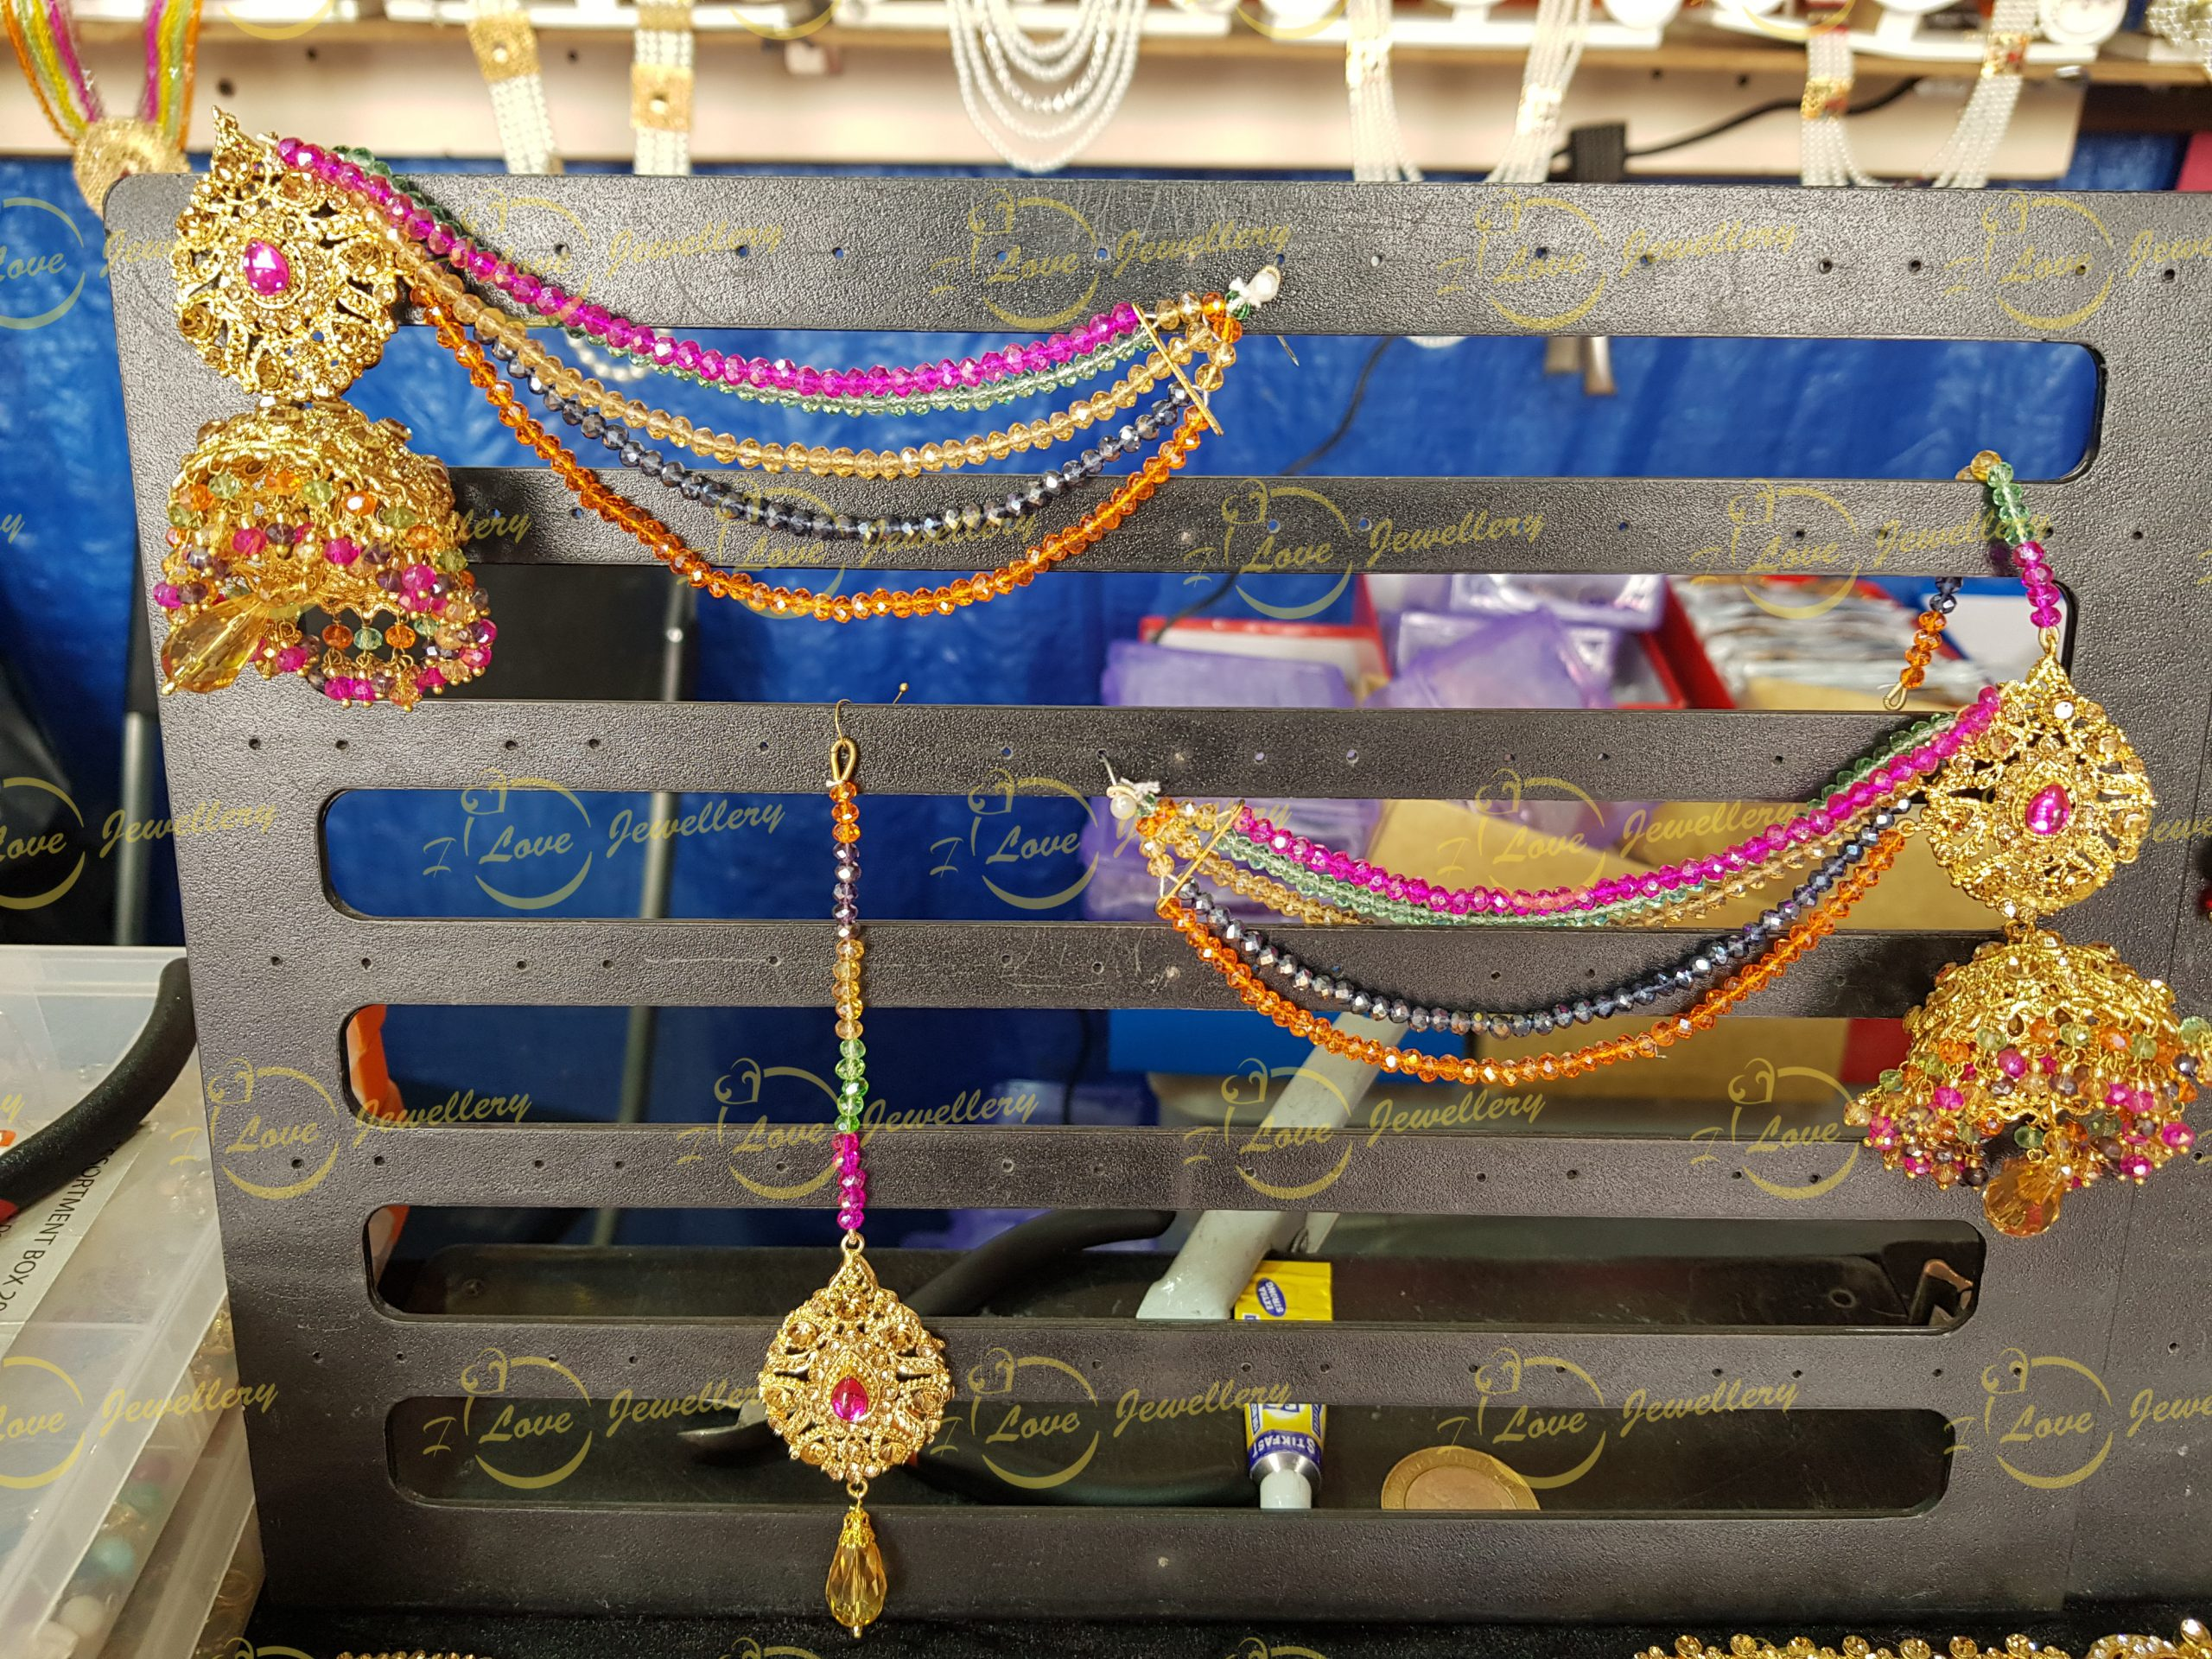 Jhumki earrings - saharay earrings - mehndi earrings - mehndi jewellery - bridal earrings- wedding earrings- wholesale Pakistani jewellery - bespoke Pakistani jewellery